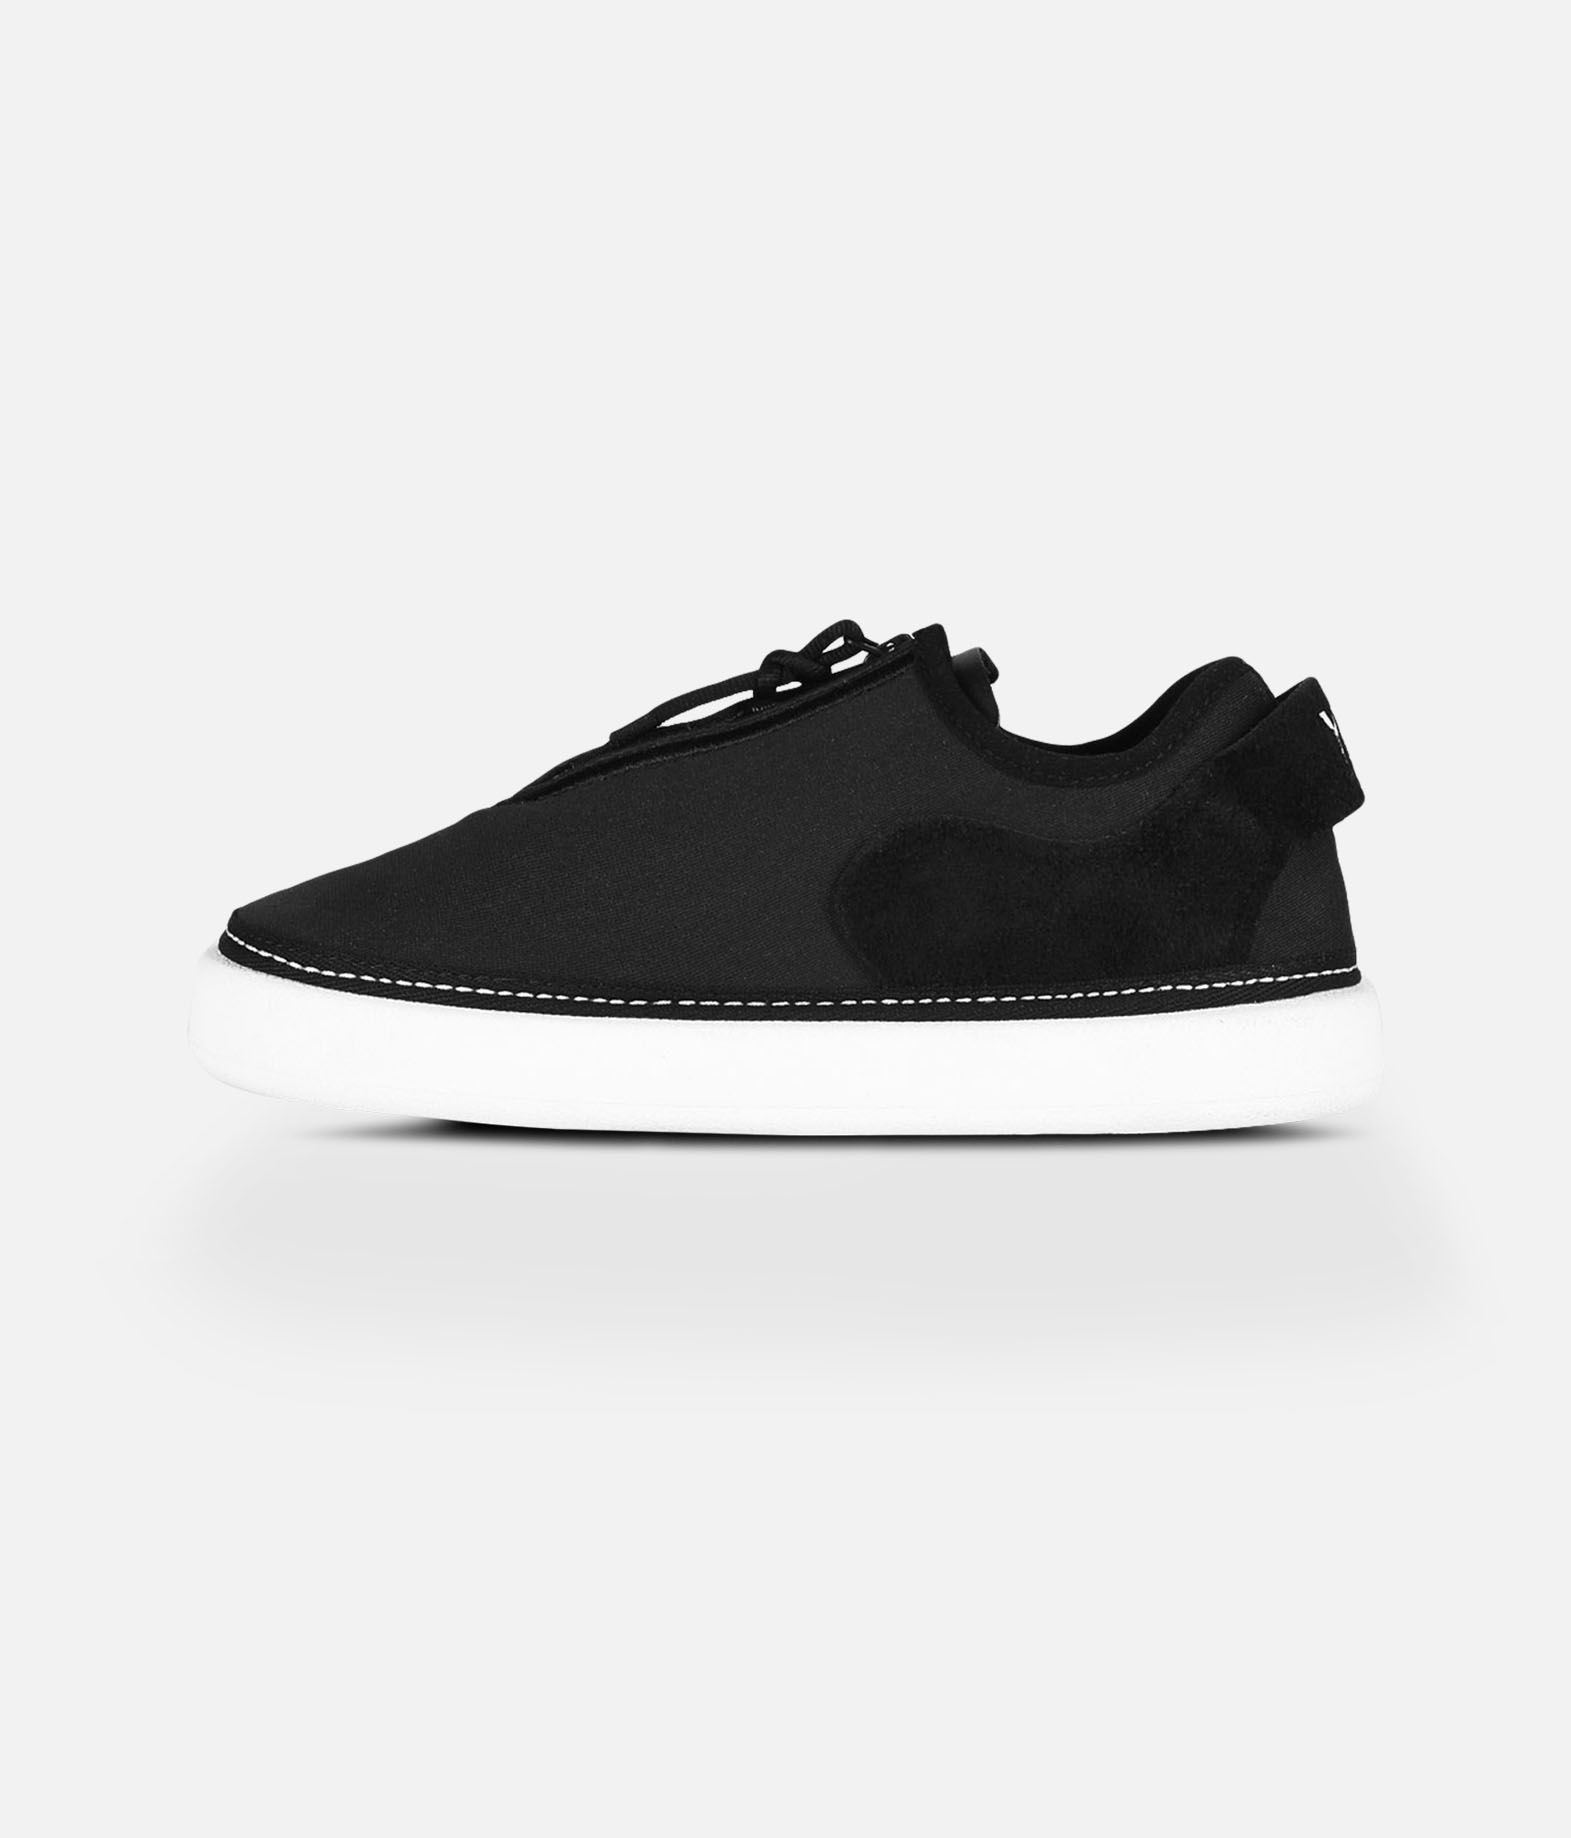 Y-3 Y-3 COMFORT ZIP Sneakers Woman f